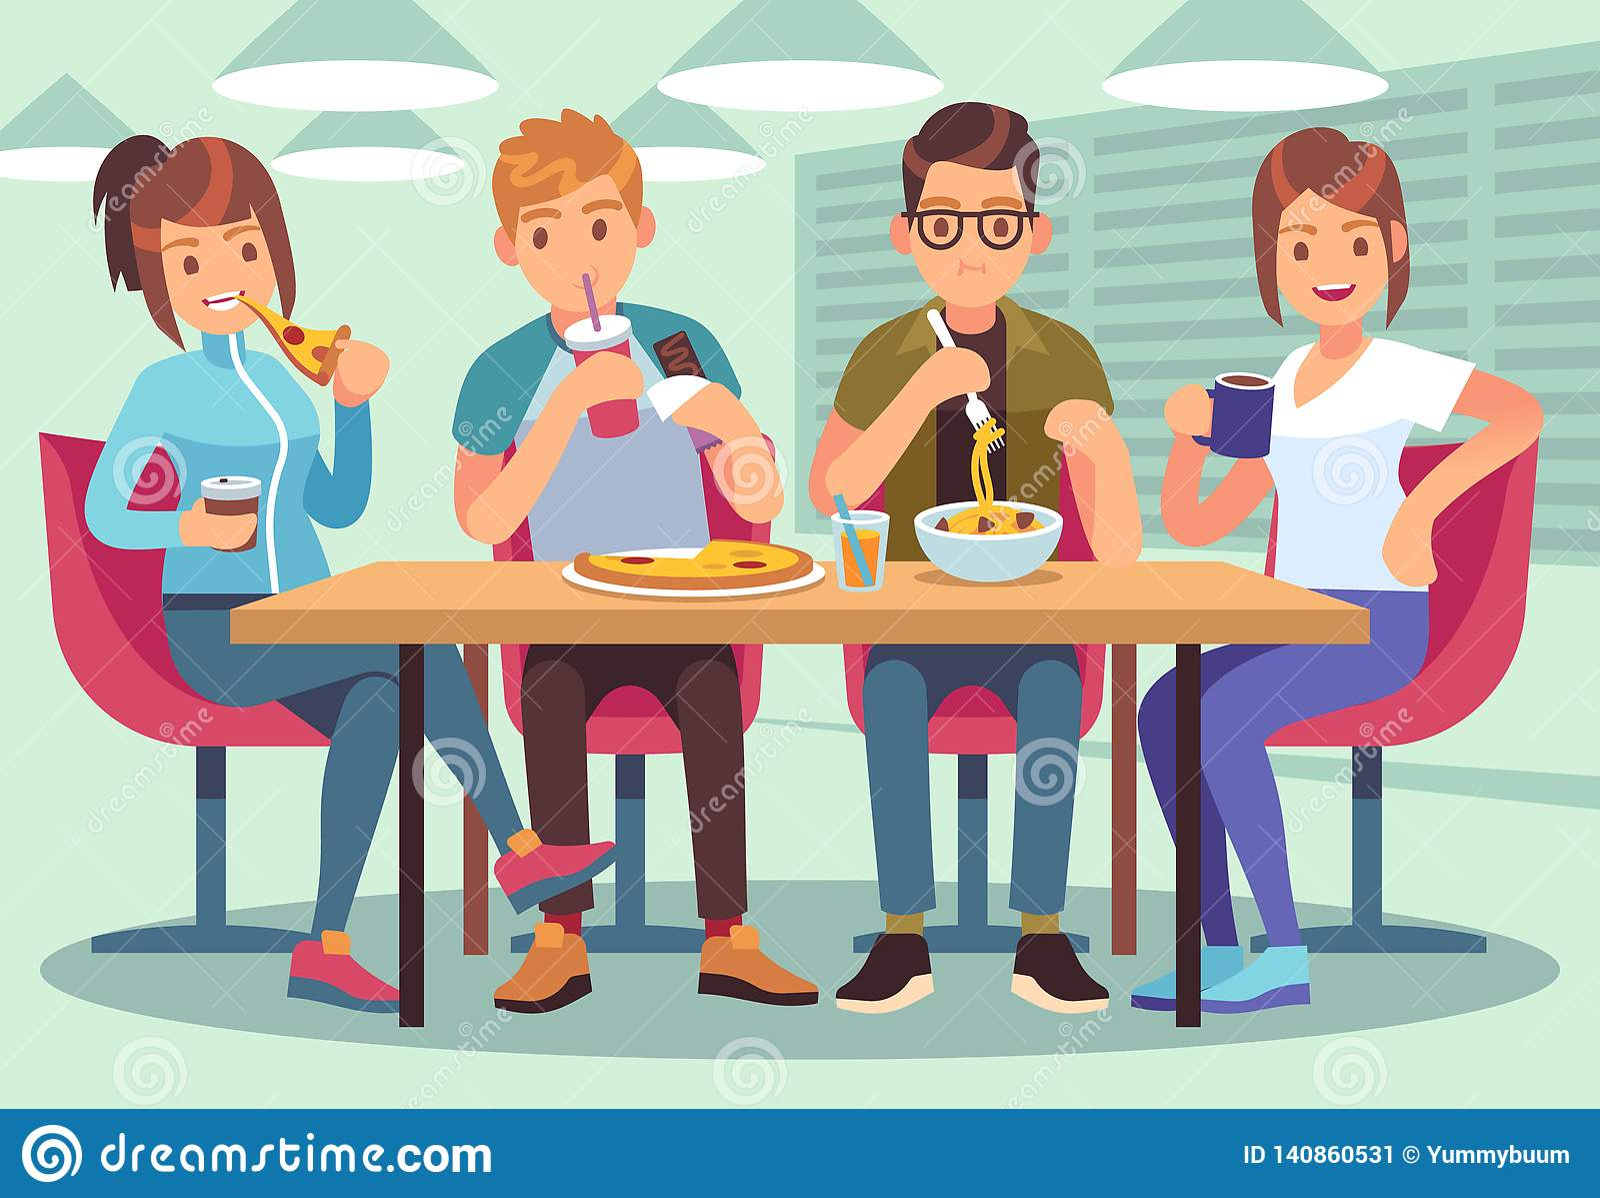 Meal clipart bar food, Meal bar food Transparent FREE for download on  WebStockReview 2020